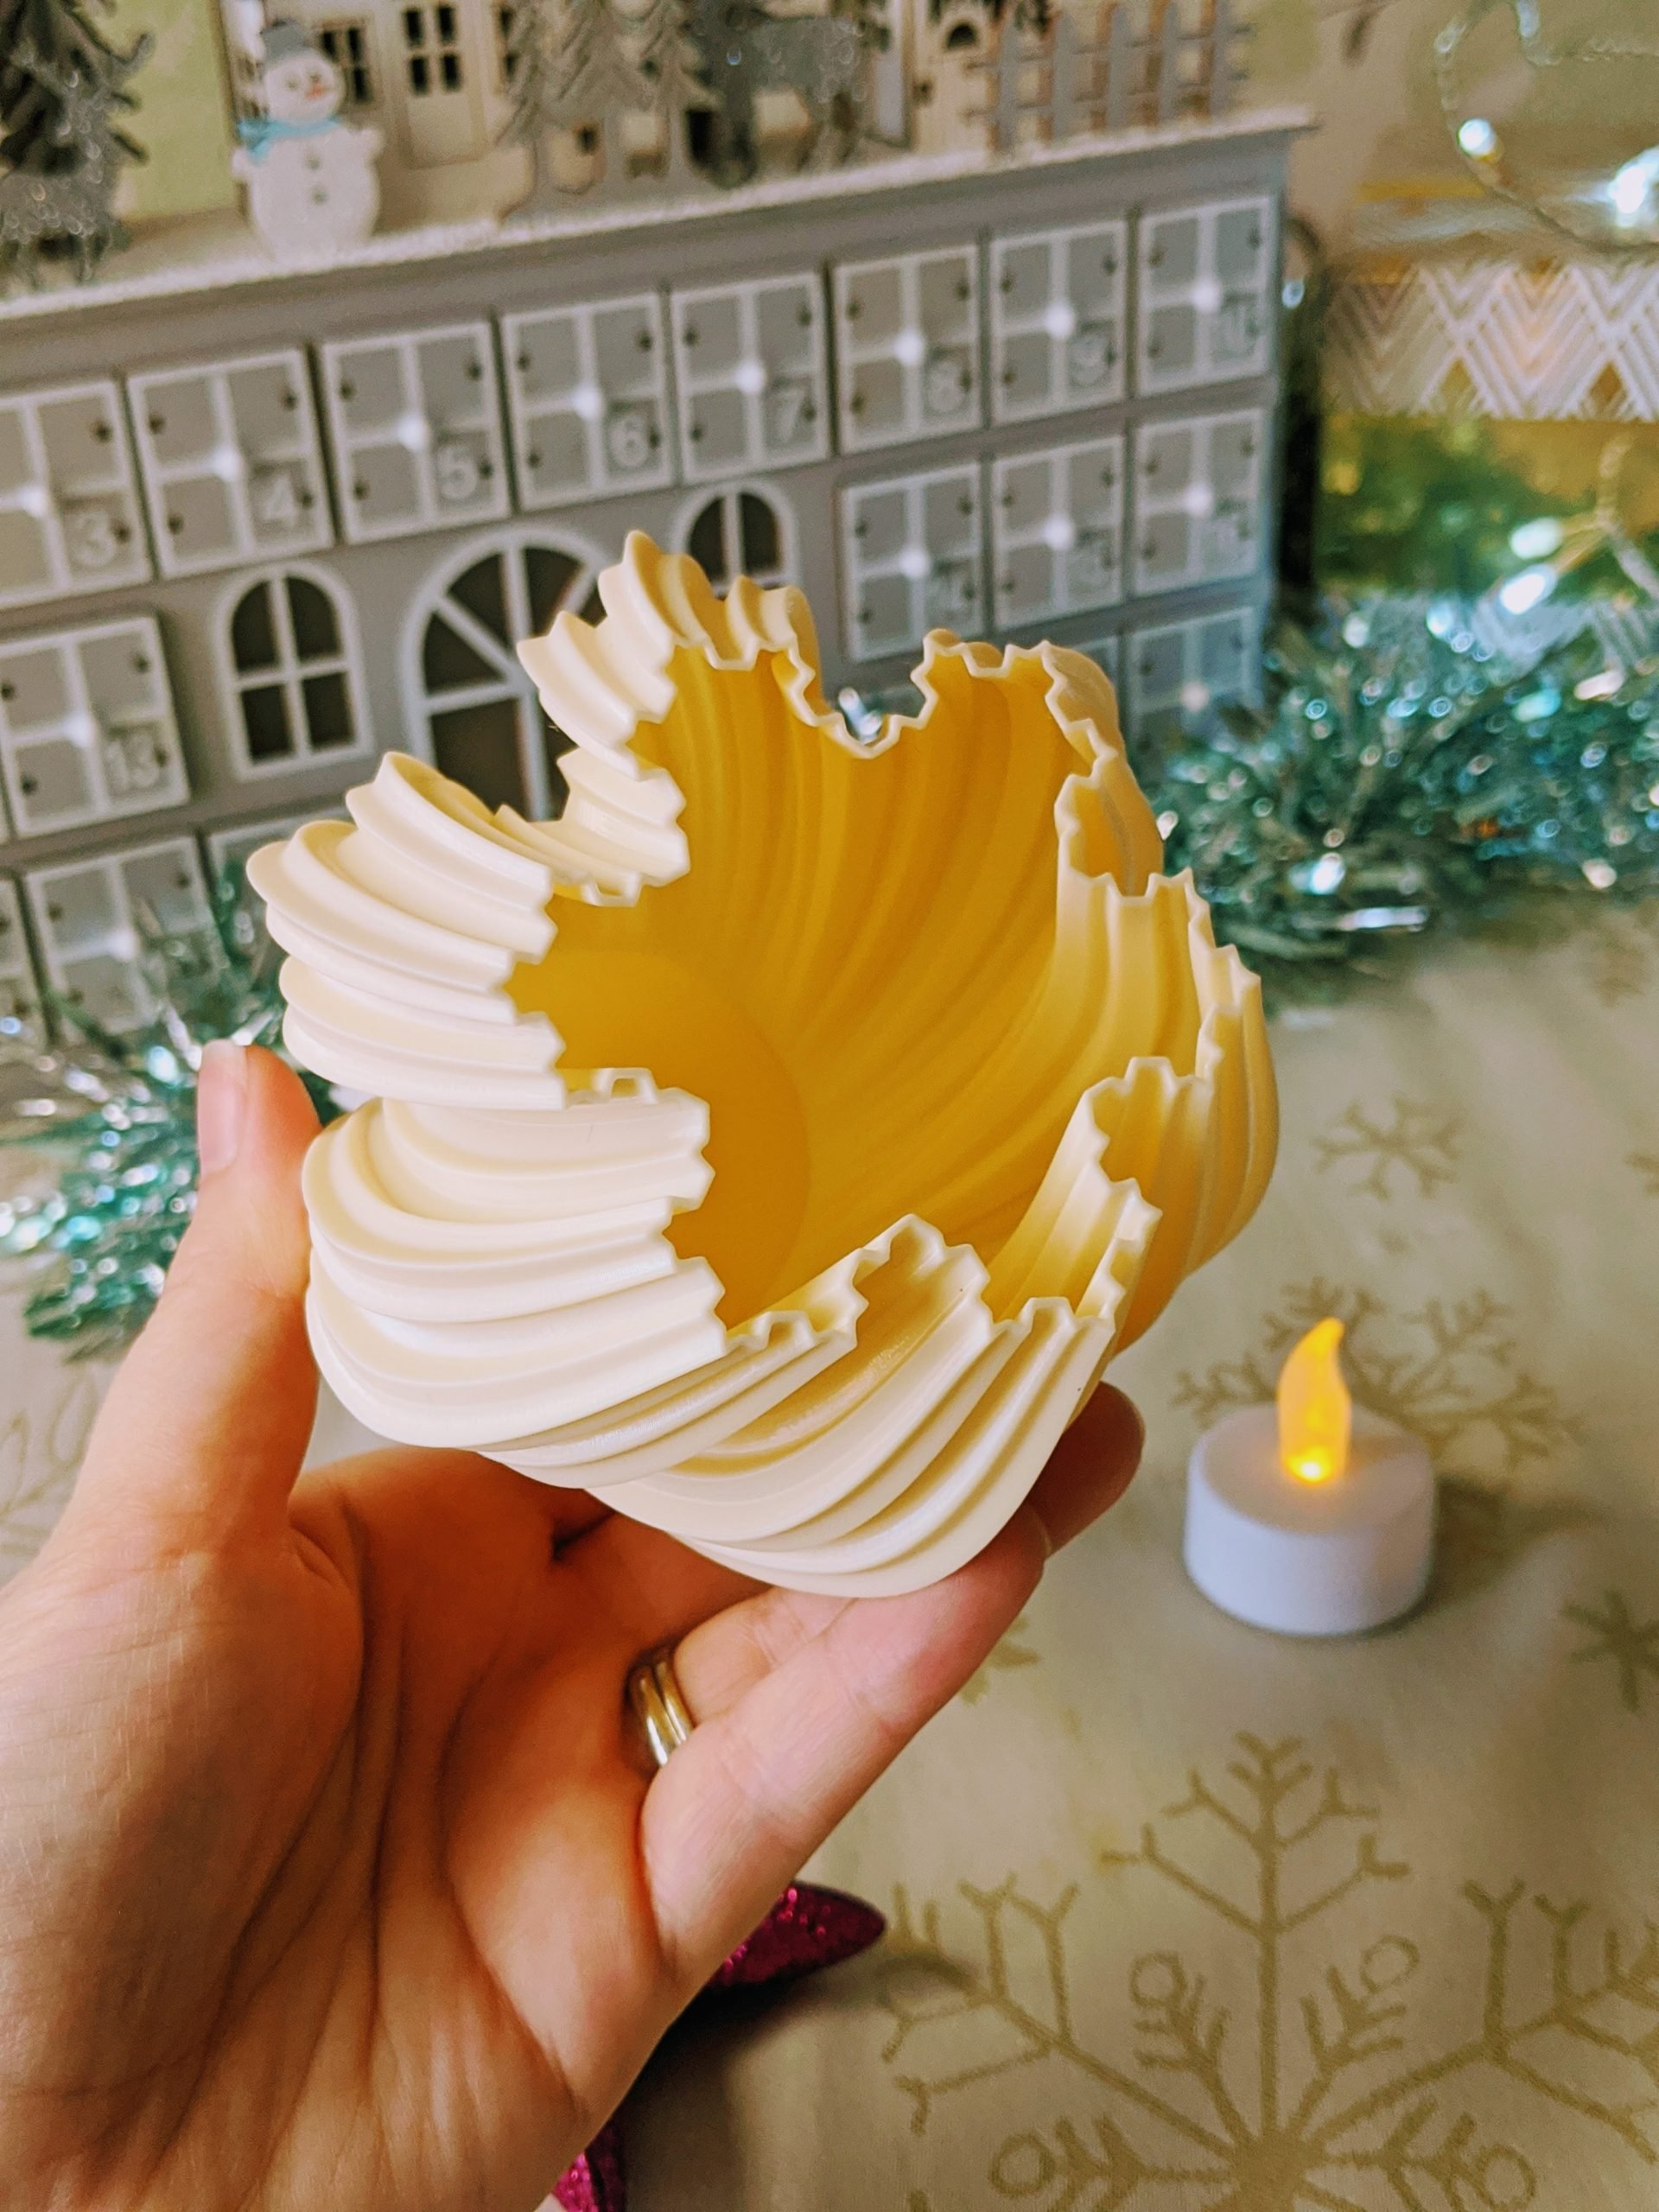 3D printed snowflake plinth for our pom pom snowman ornament